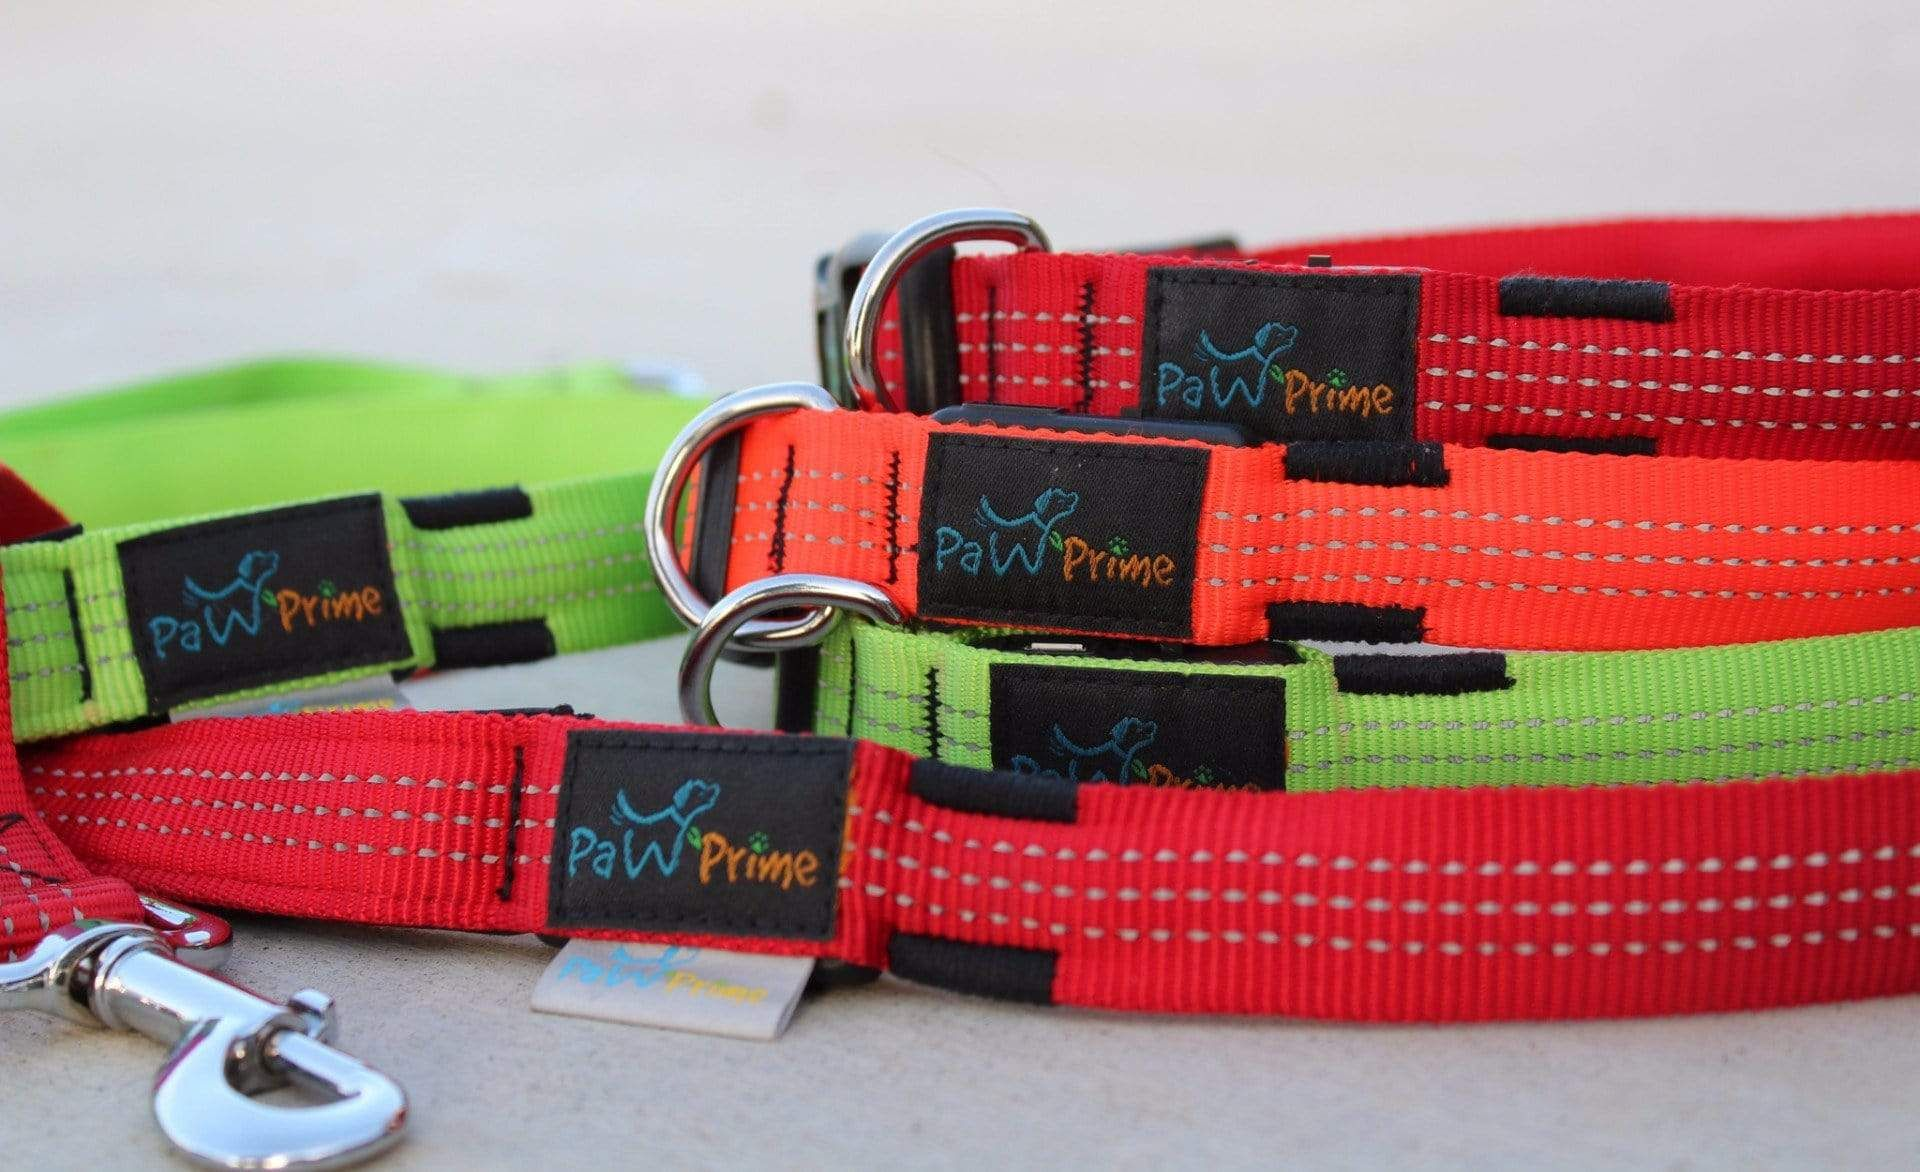 Pets Prime Rechargeable LED Collar V2 Led dog collar